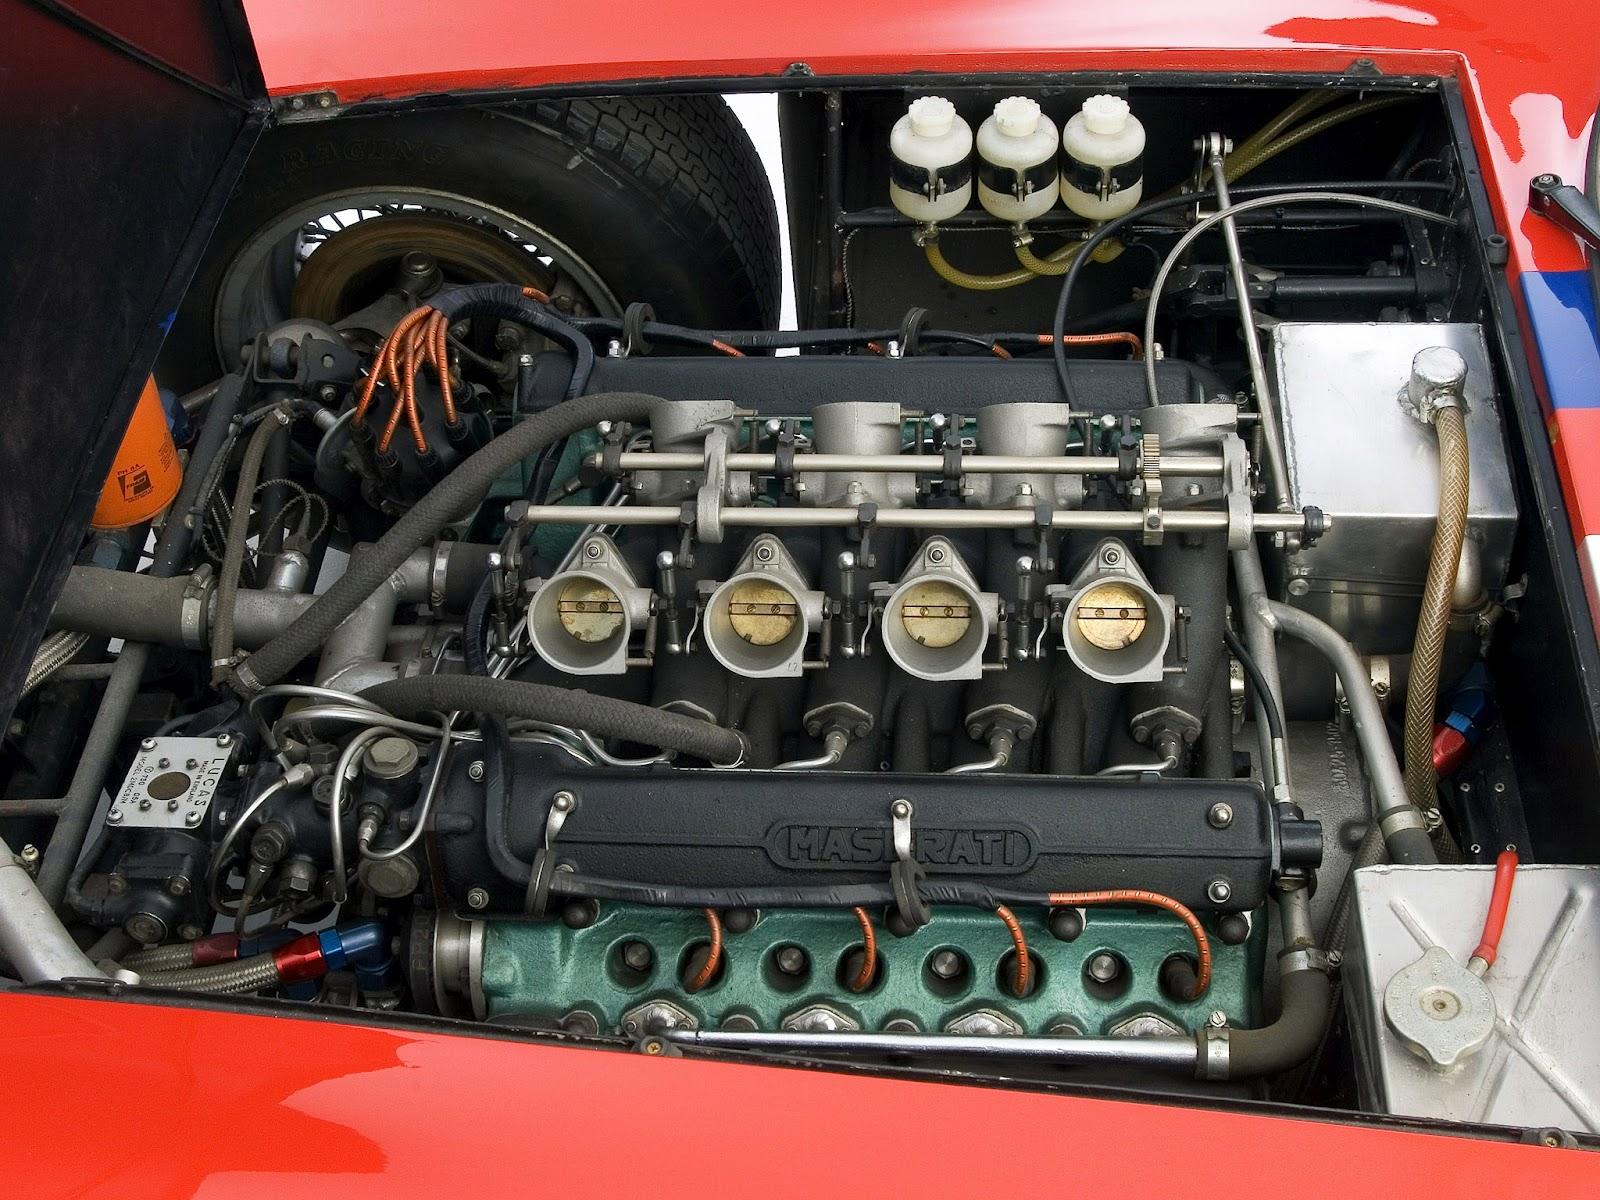 1963_Maserati_Tipo_151-3_005_8397.jpg